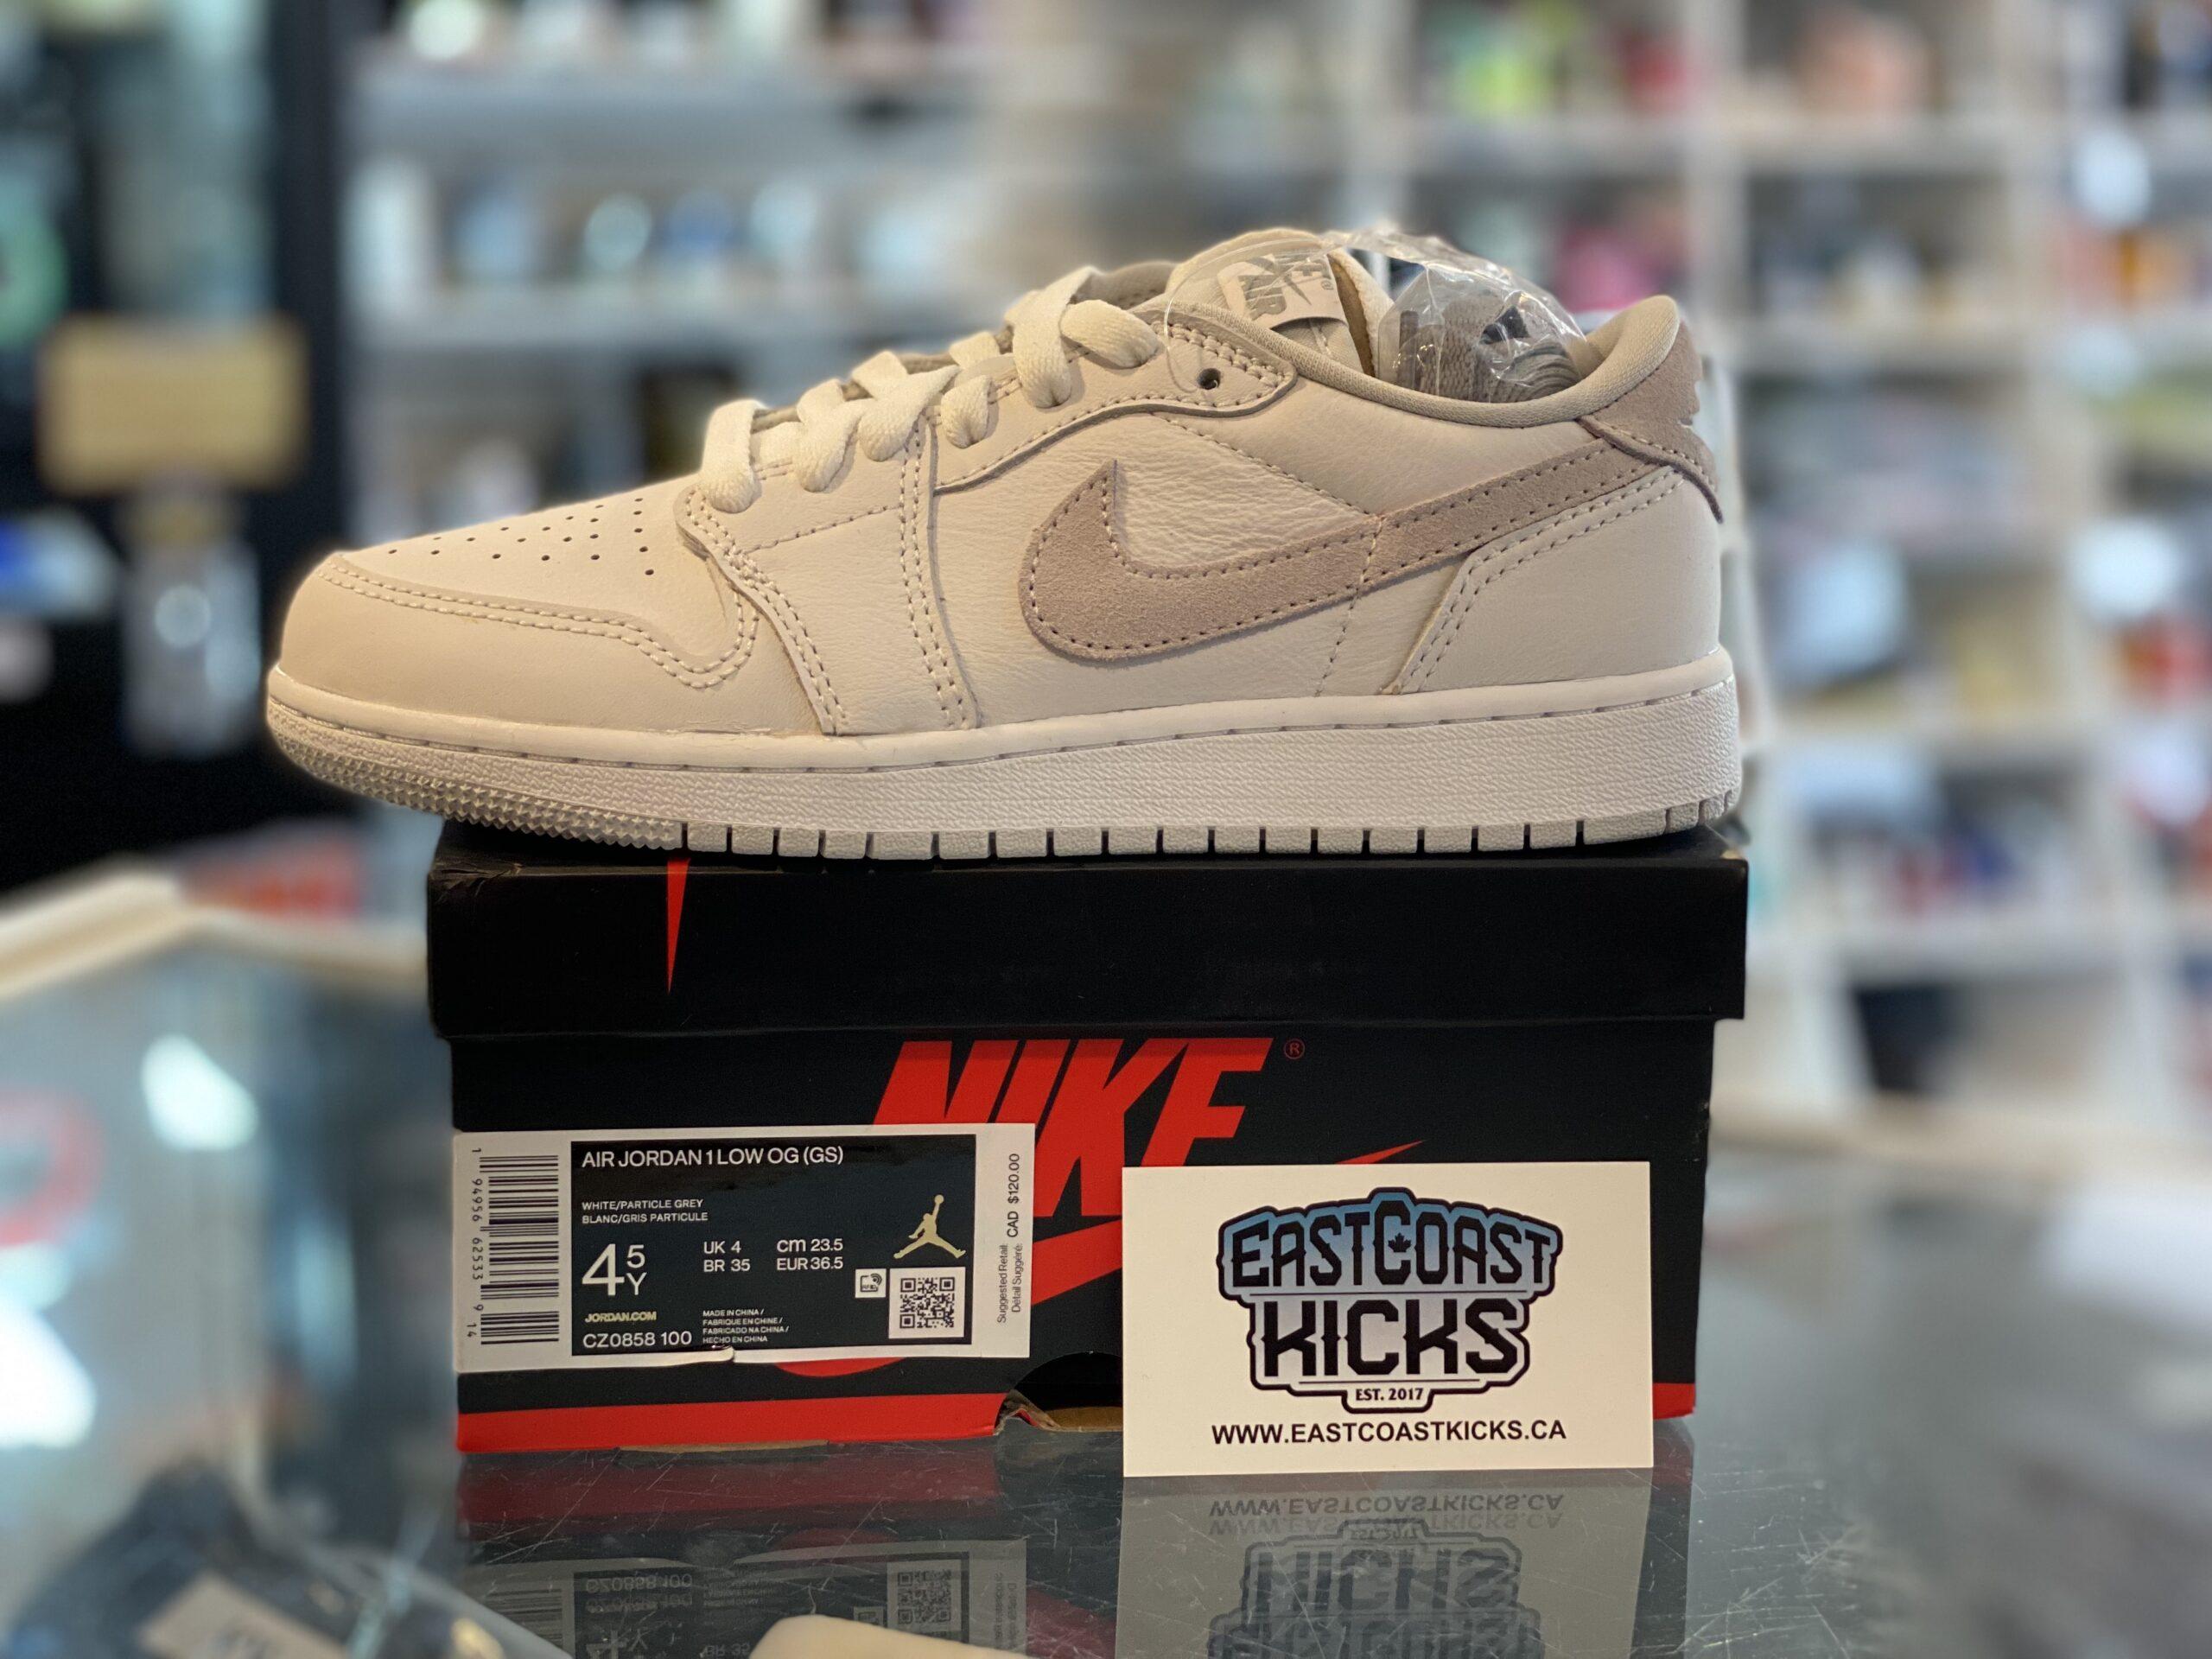 Jordan 1 Low Neutral Grey Size 4.5Y